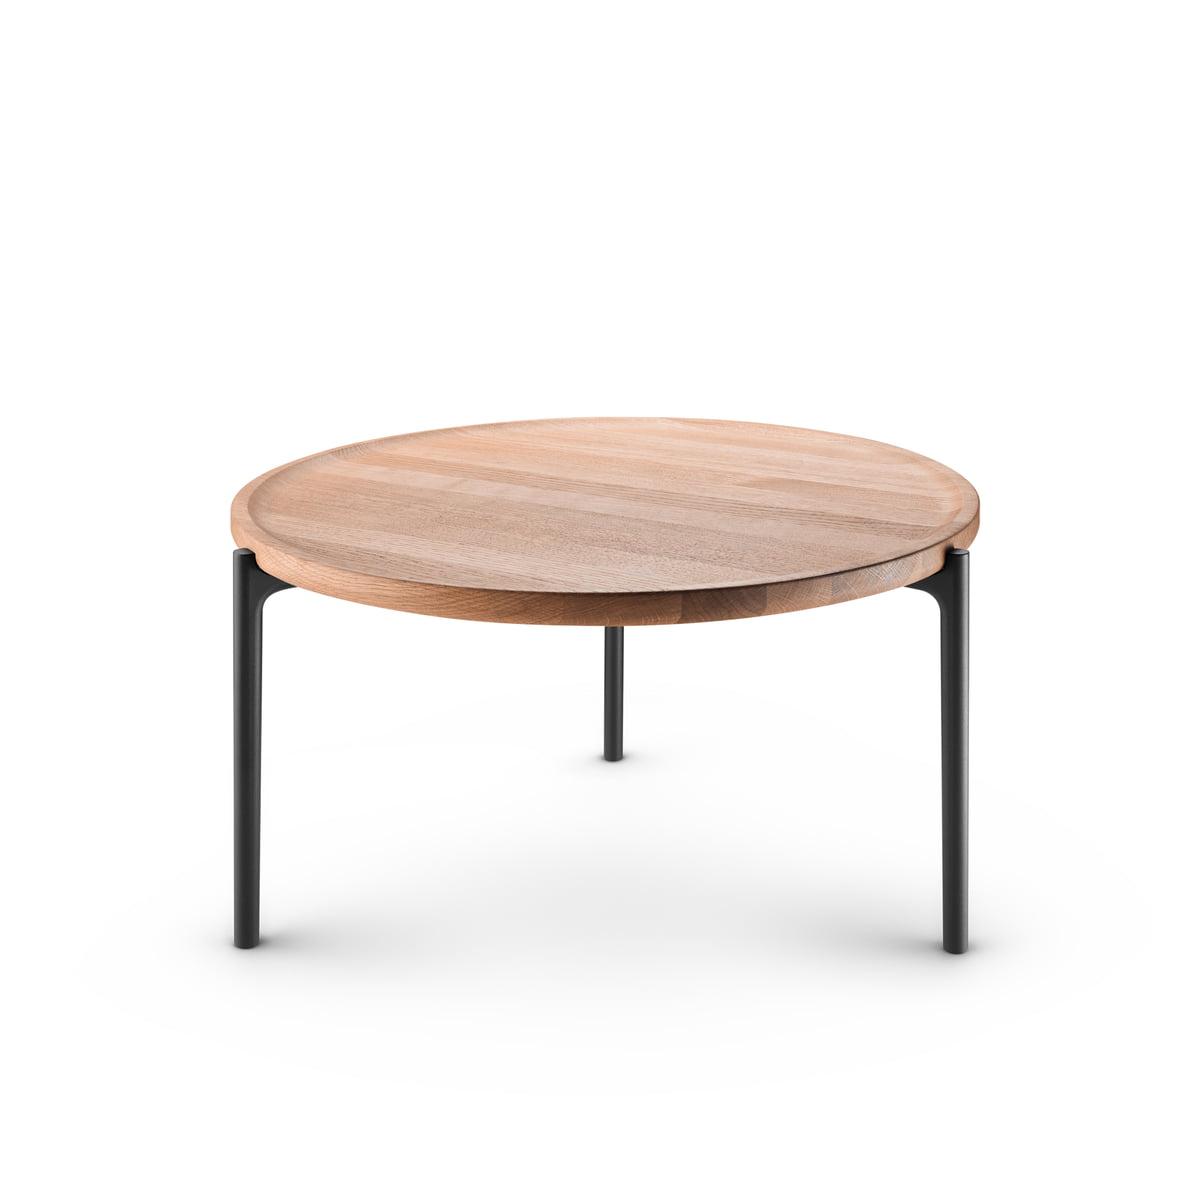 Tremendous Eva Solo Savoye Coffee Table O 60 Cm Oak Natural Black Andrewgaddart Wooden Chair Designs For Living Room Andrewgaddartcom